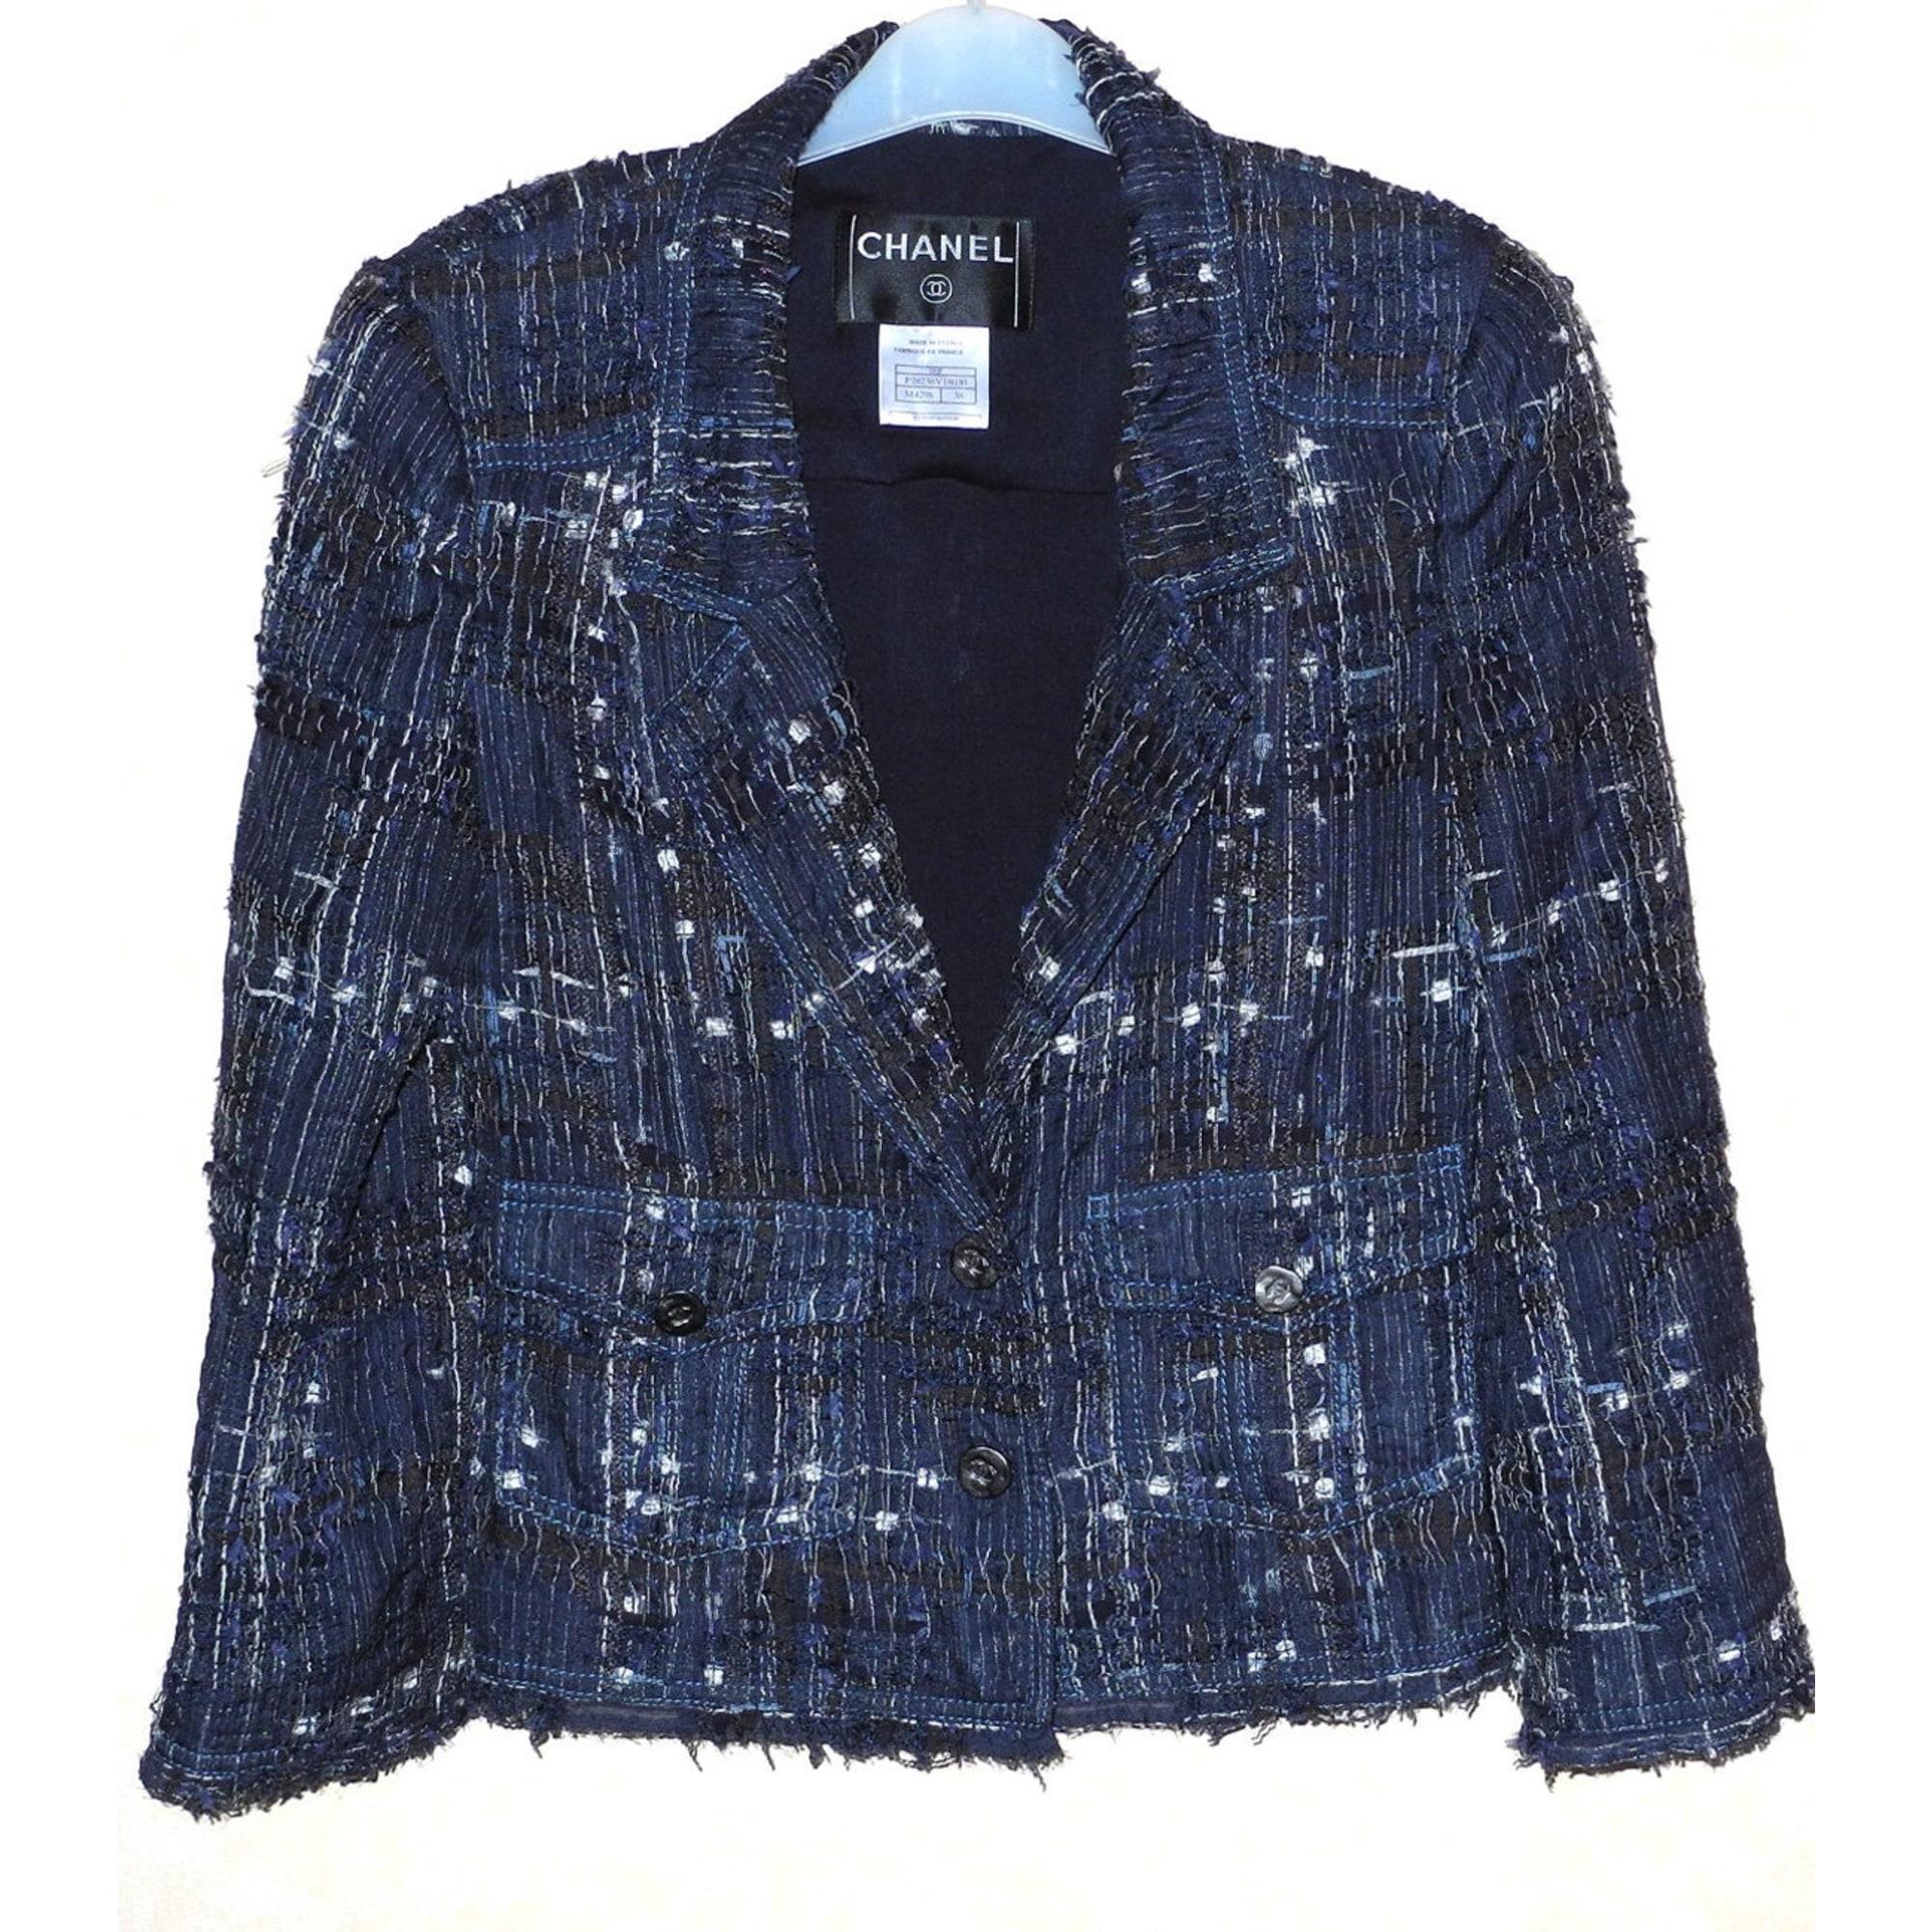 Blazer, veste tailleur CHANEL Bleu, bleu marine, bleu turquoise